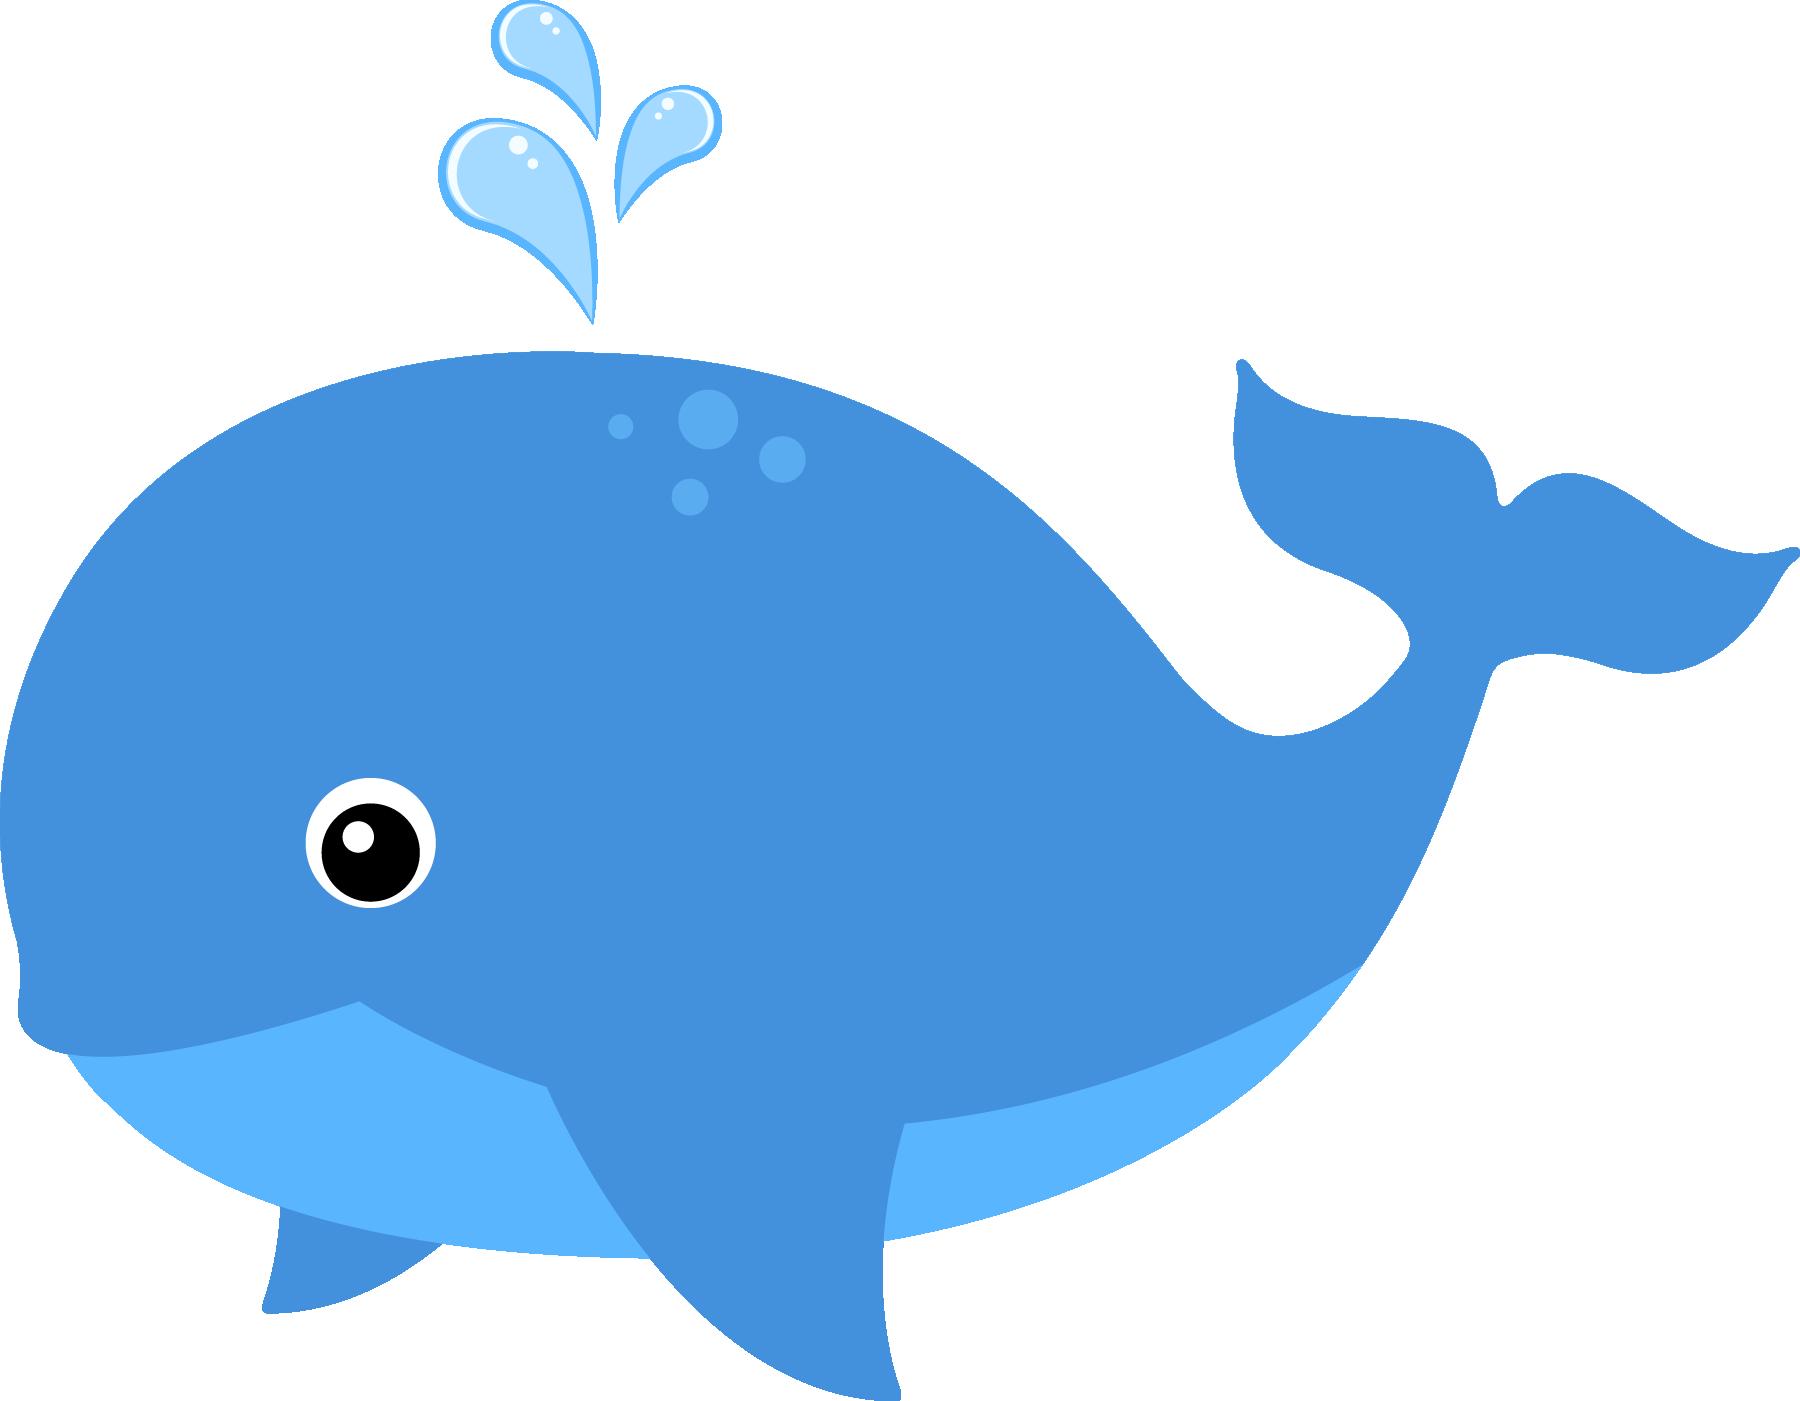 Cute cartoon whale clipart image Baby Whale Clipart | Free download best Baby Whale Clipart on ... image